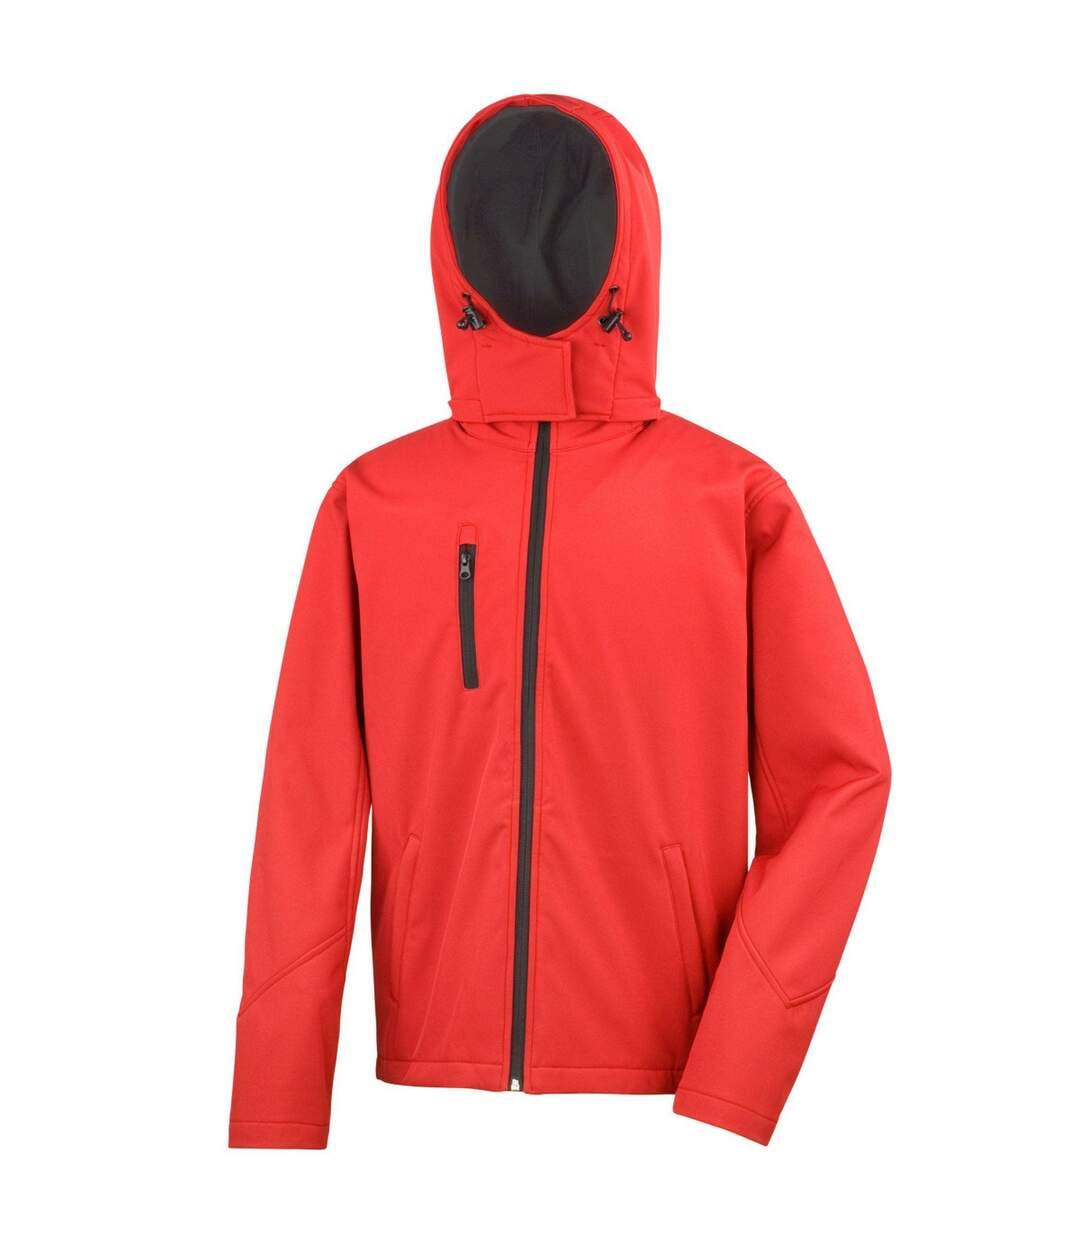 Result Core Mens Lite Hooded Softshell Jacket (Red/Black) - UTBC3253